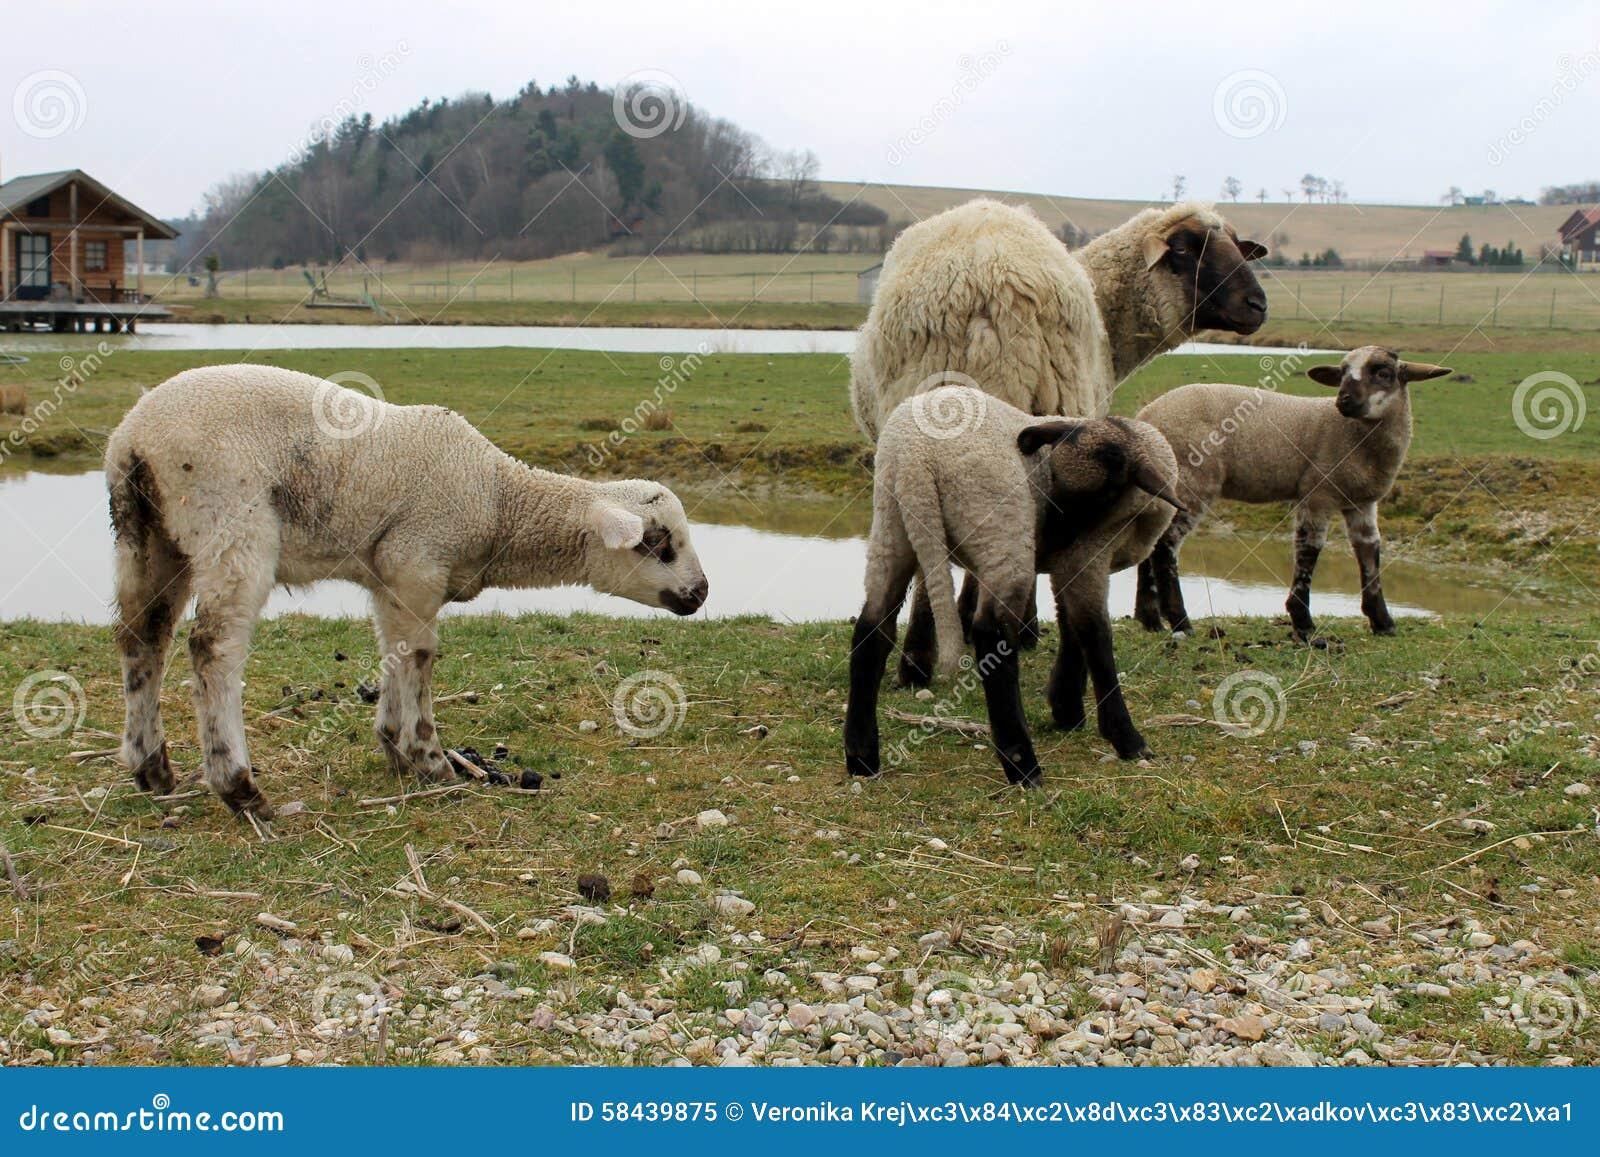 Sheep near the pond